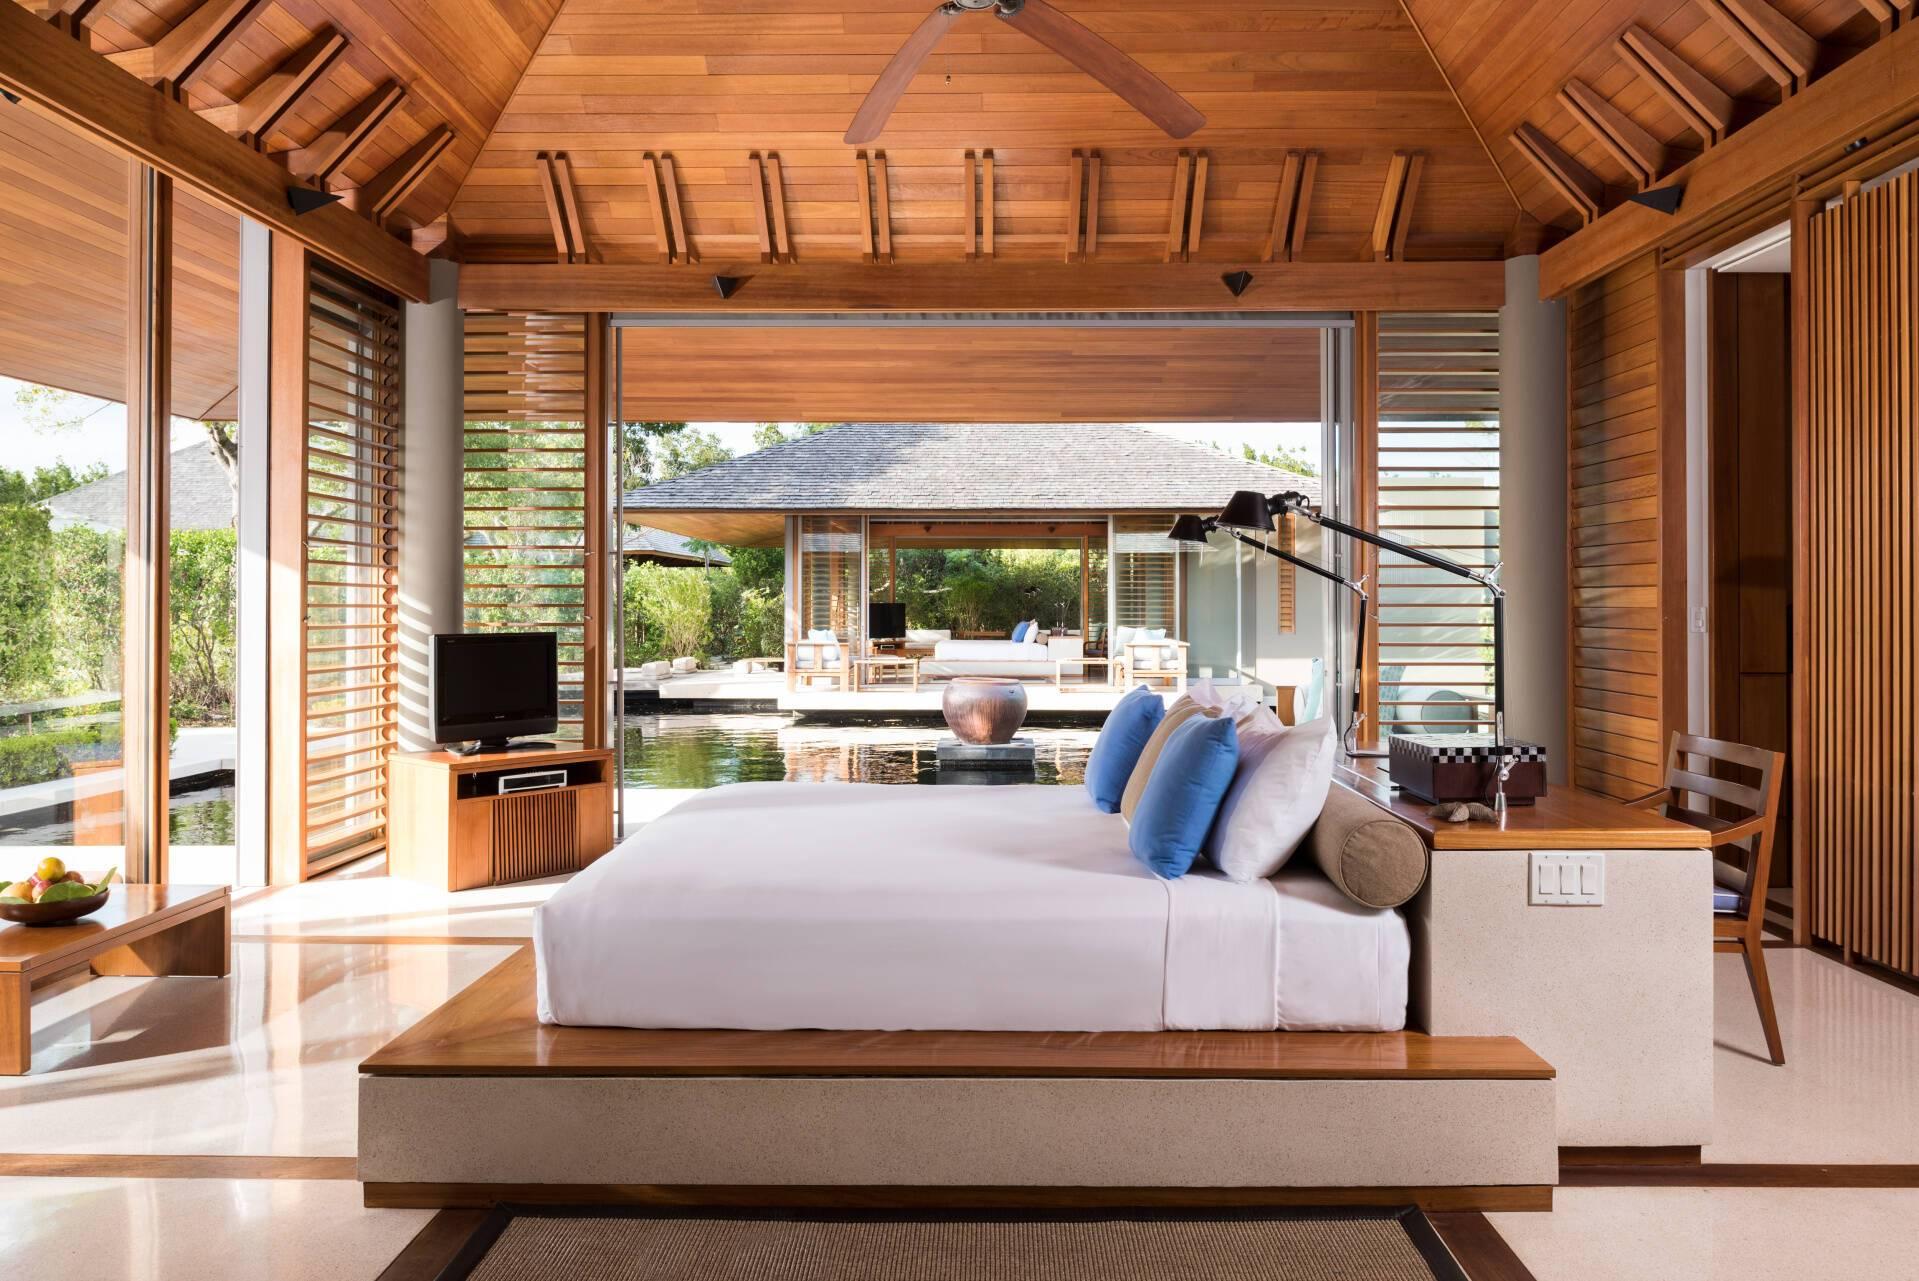 Amanyara Villa Chambre Turks et Caicos